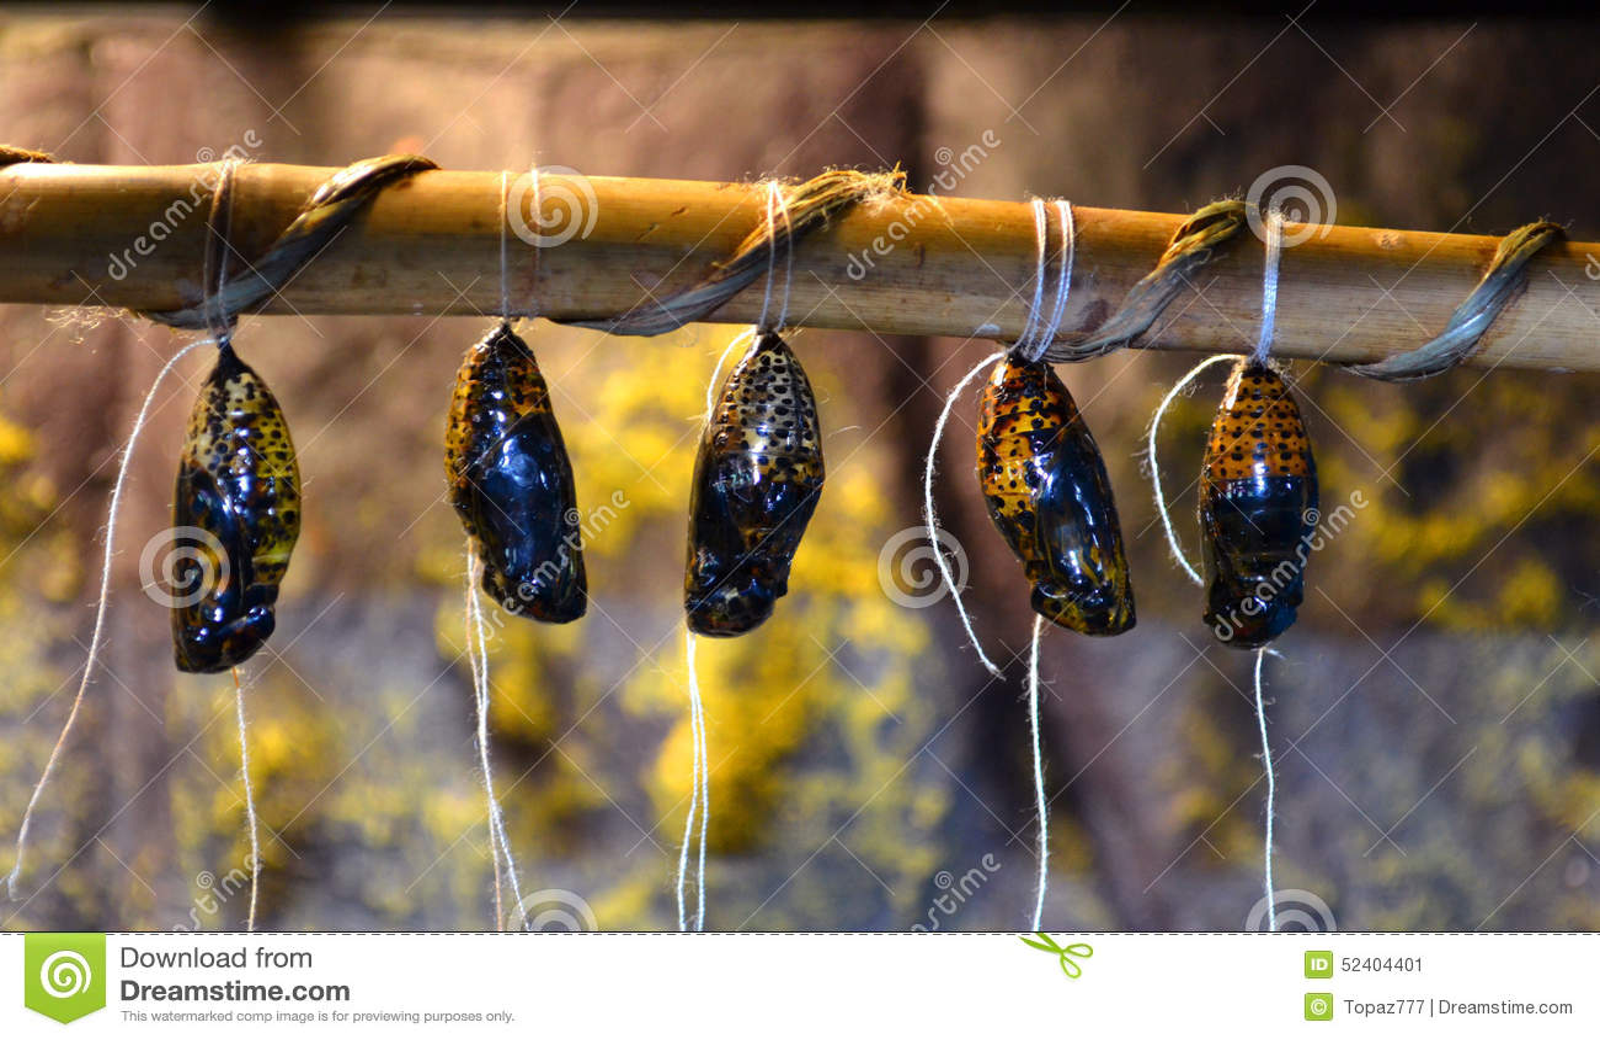 cocon de papillon image stock image du larve antenne. Black Bedroom Furniture Sets. Home Design Ideas